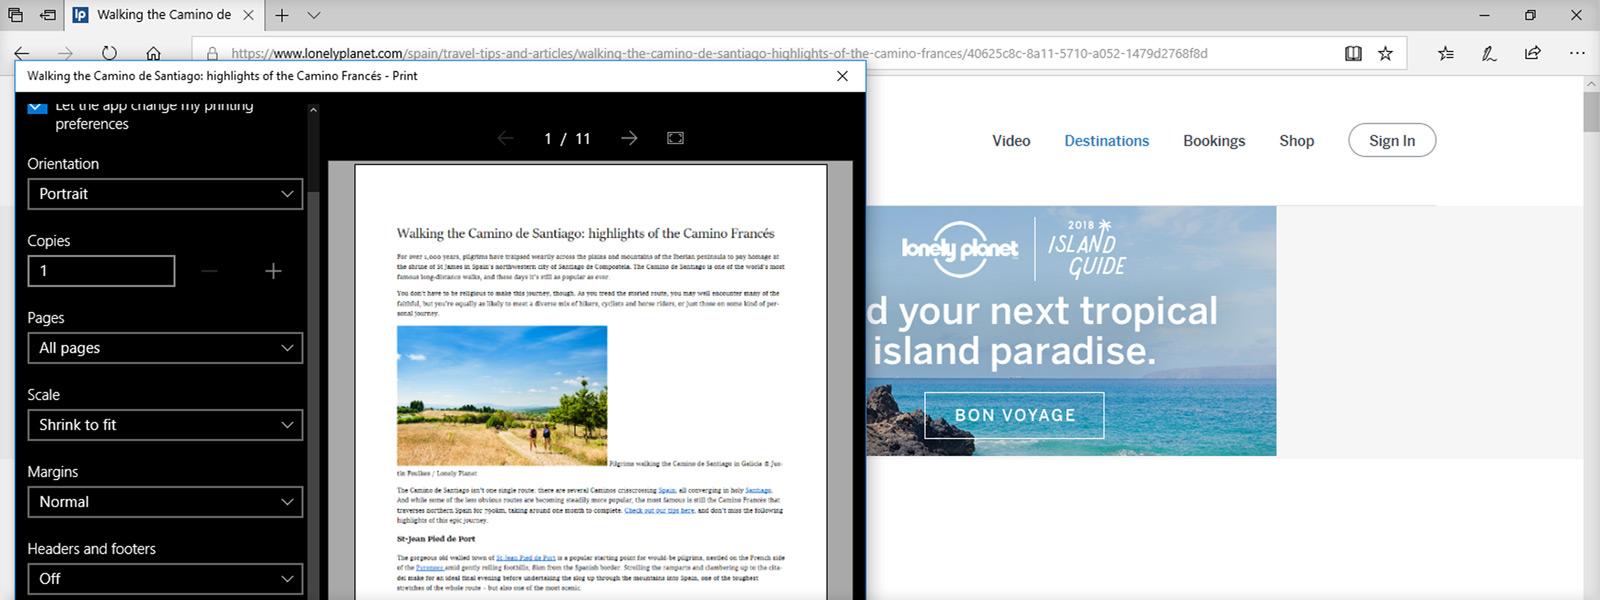 Edge 浏览器中给定网页无广告打印预览的屏幕图像